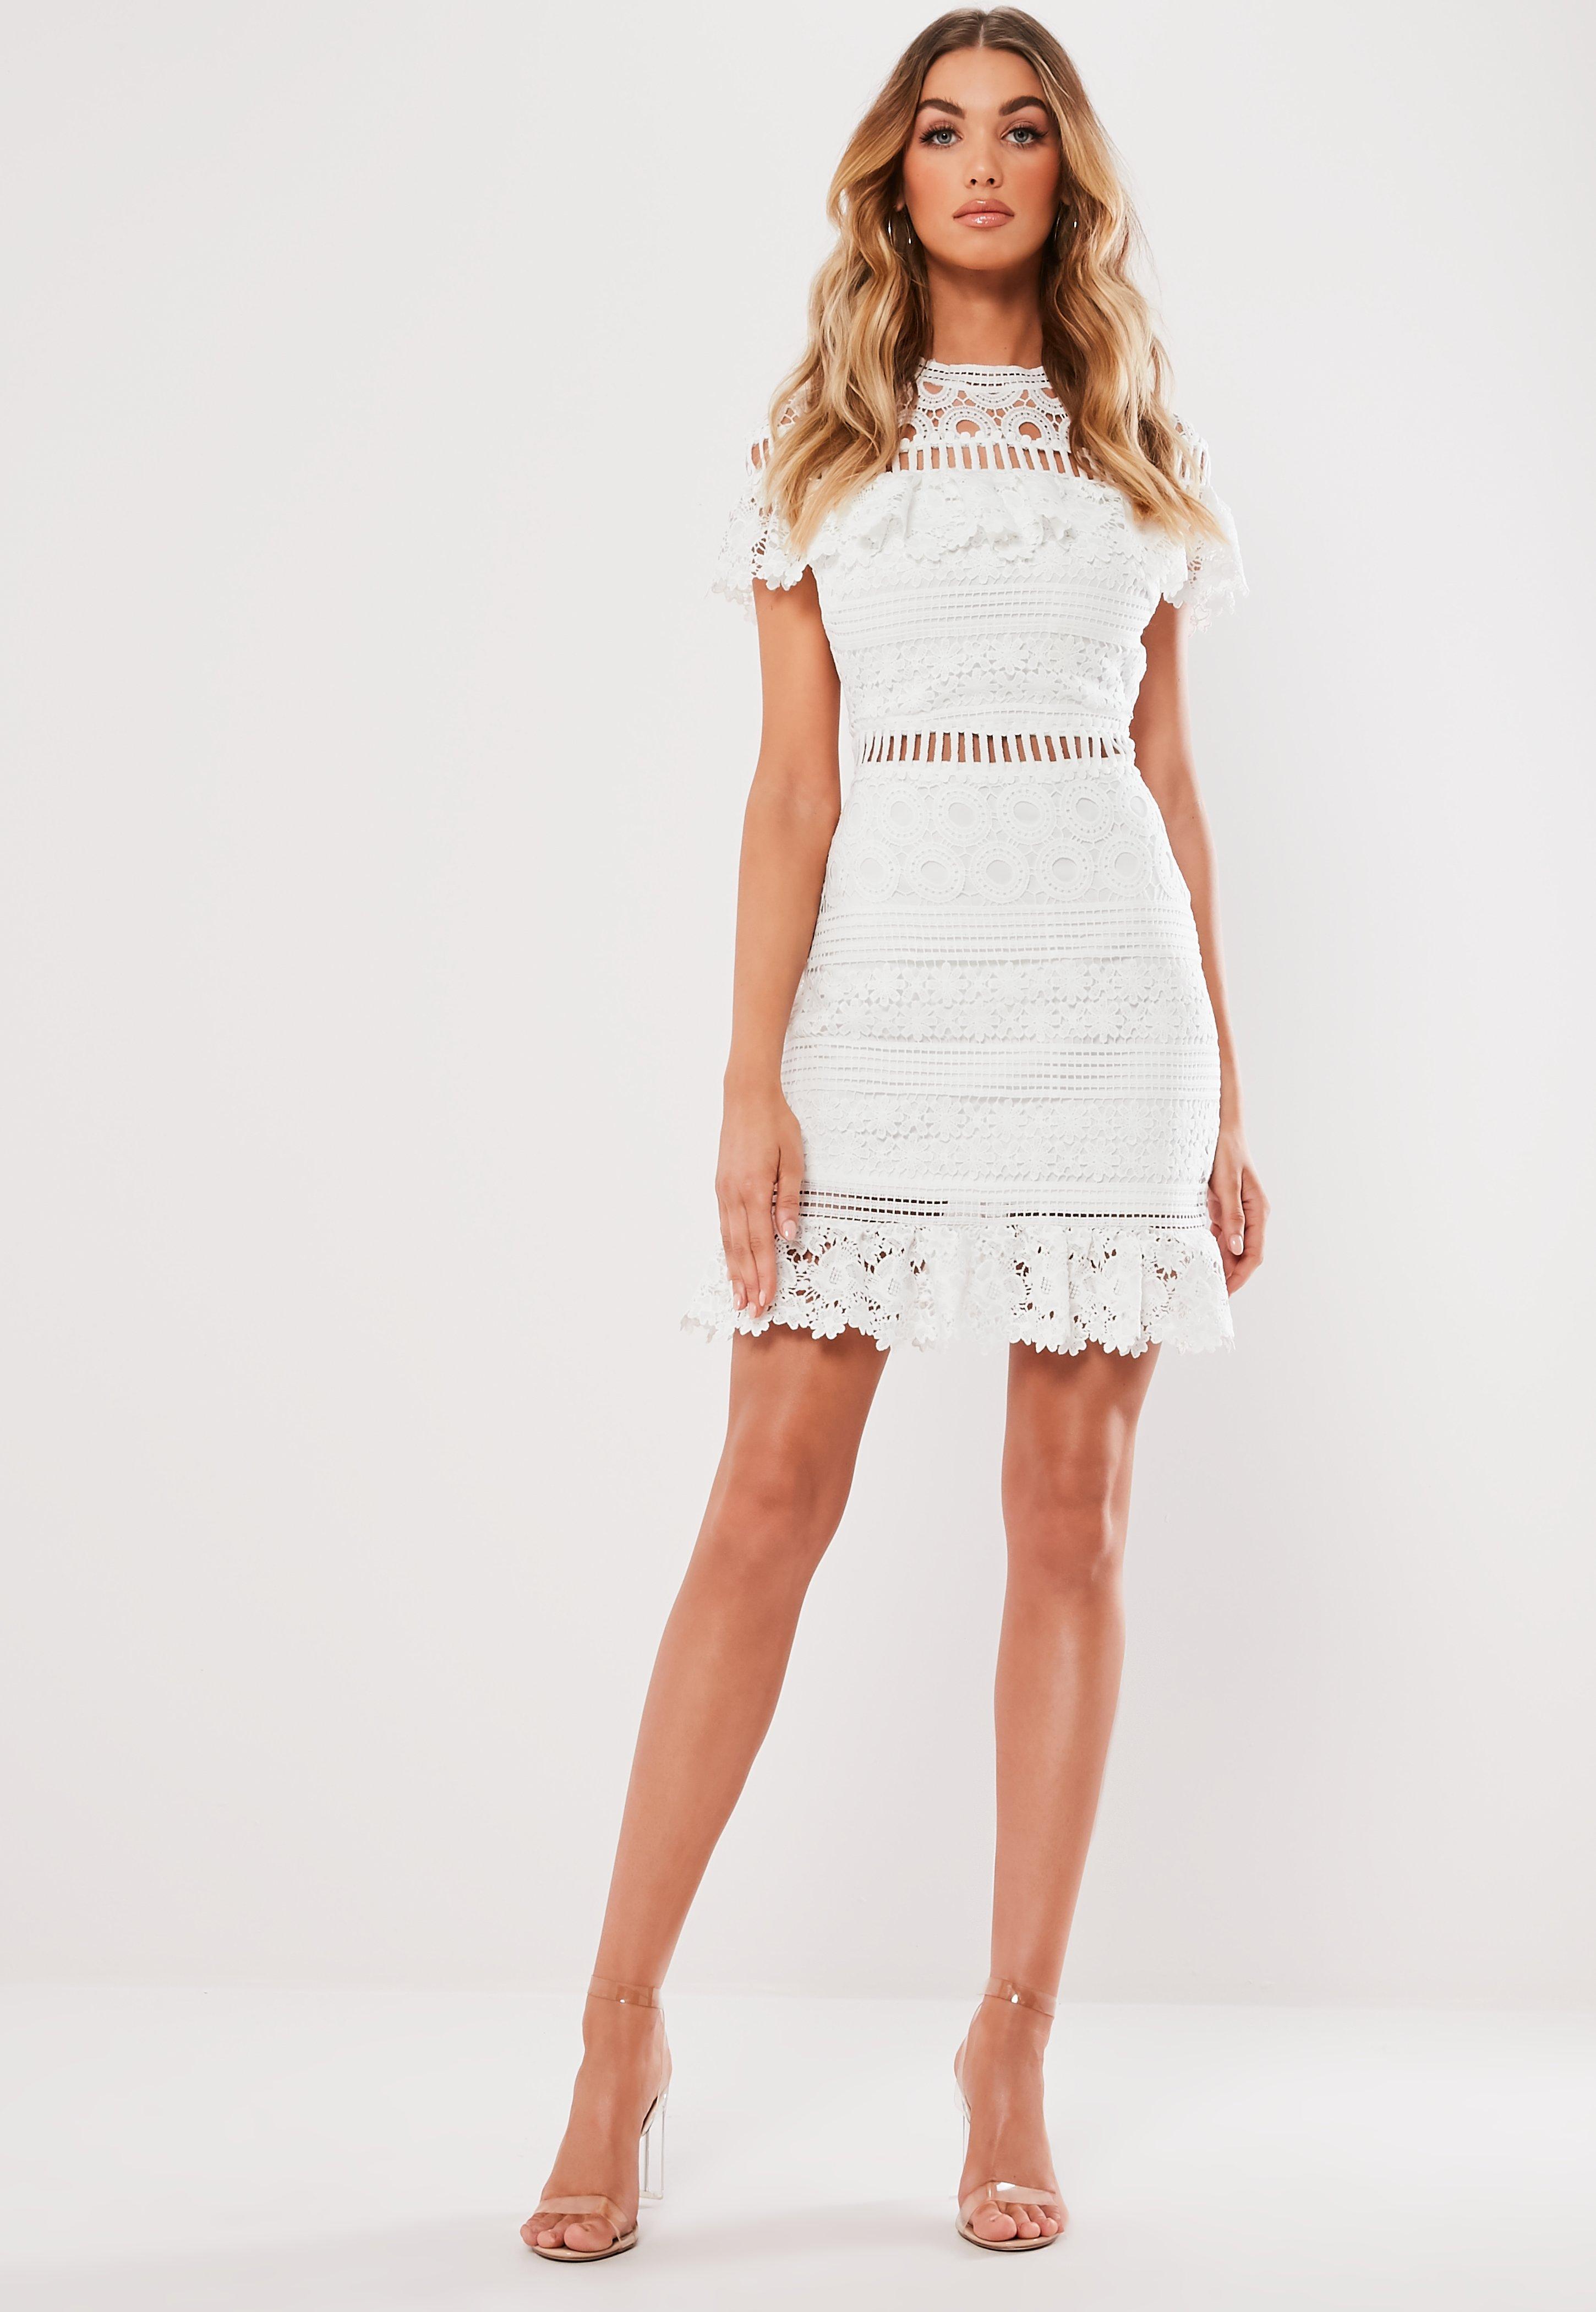 3626f8c888 Vestidos blancos